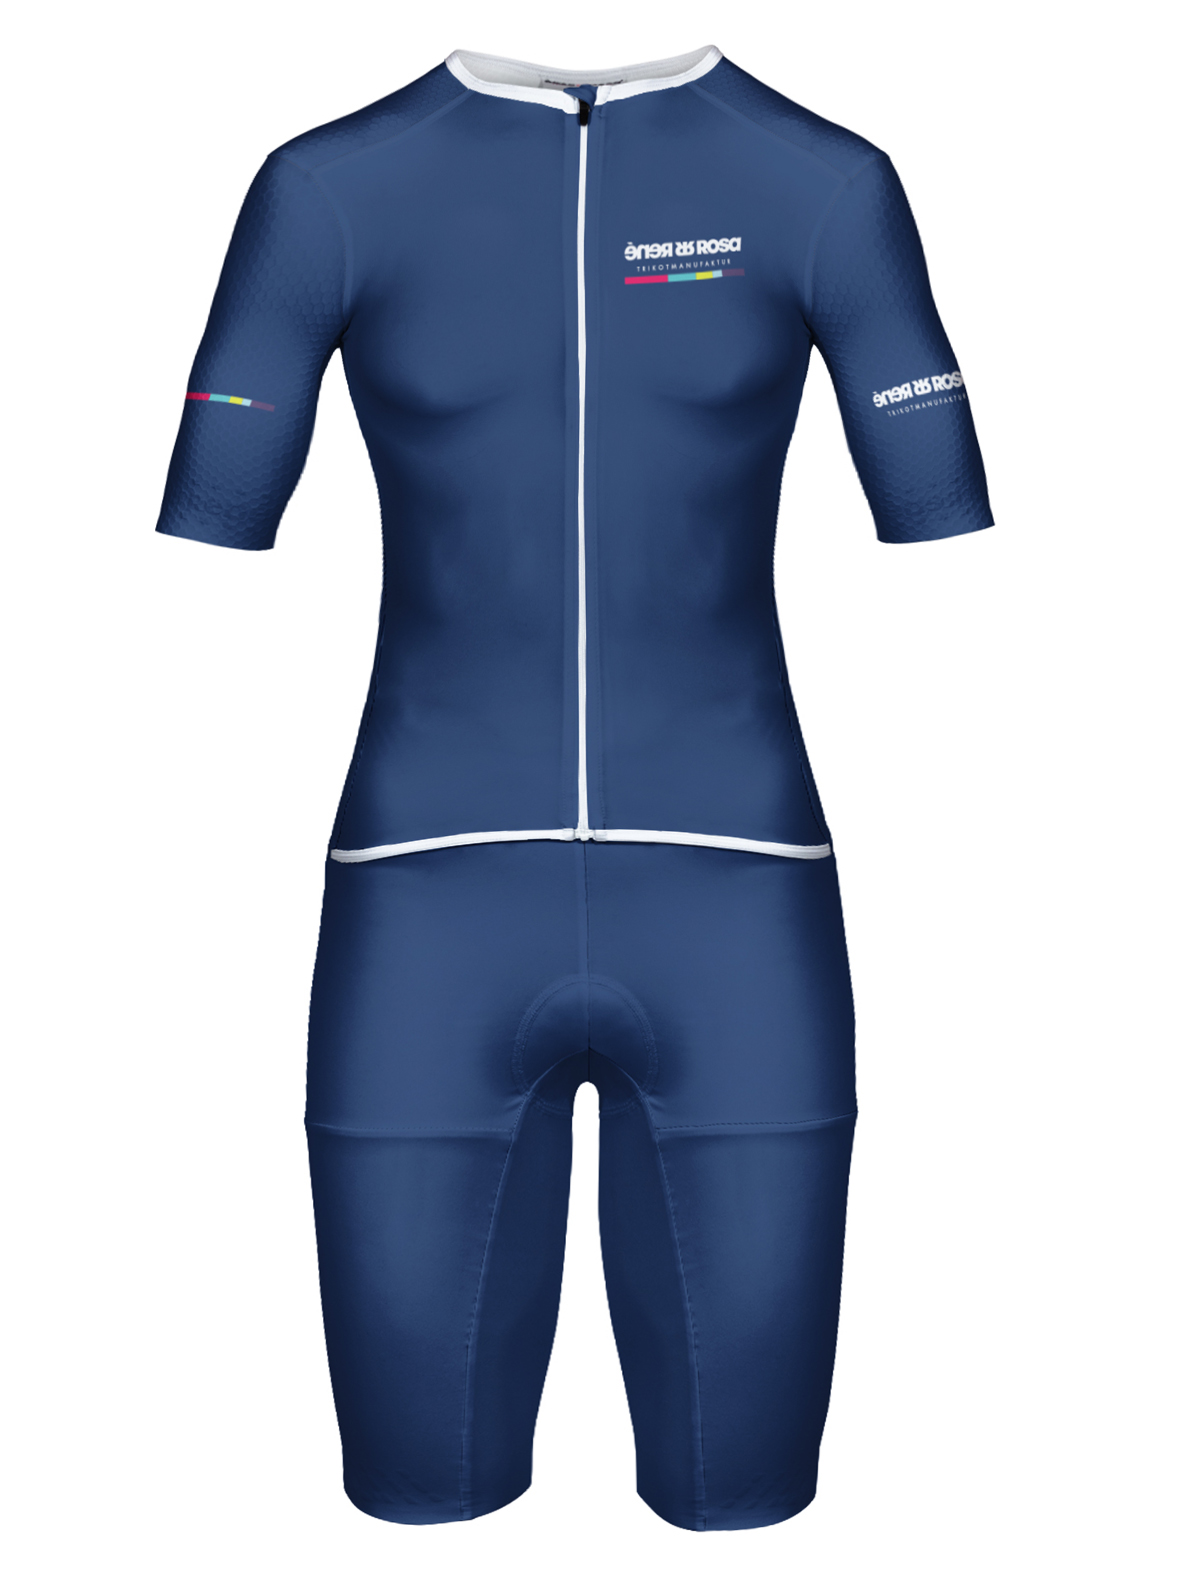 Aero Triathlon Einteiler  RRT2777W Damen / RR-Stripes blau